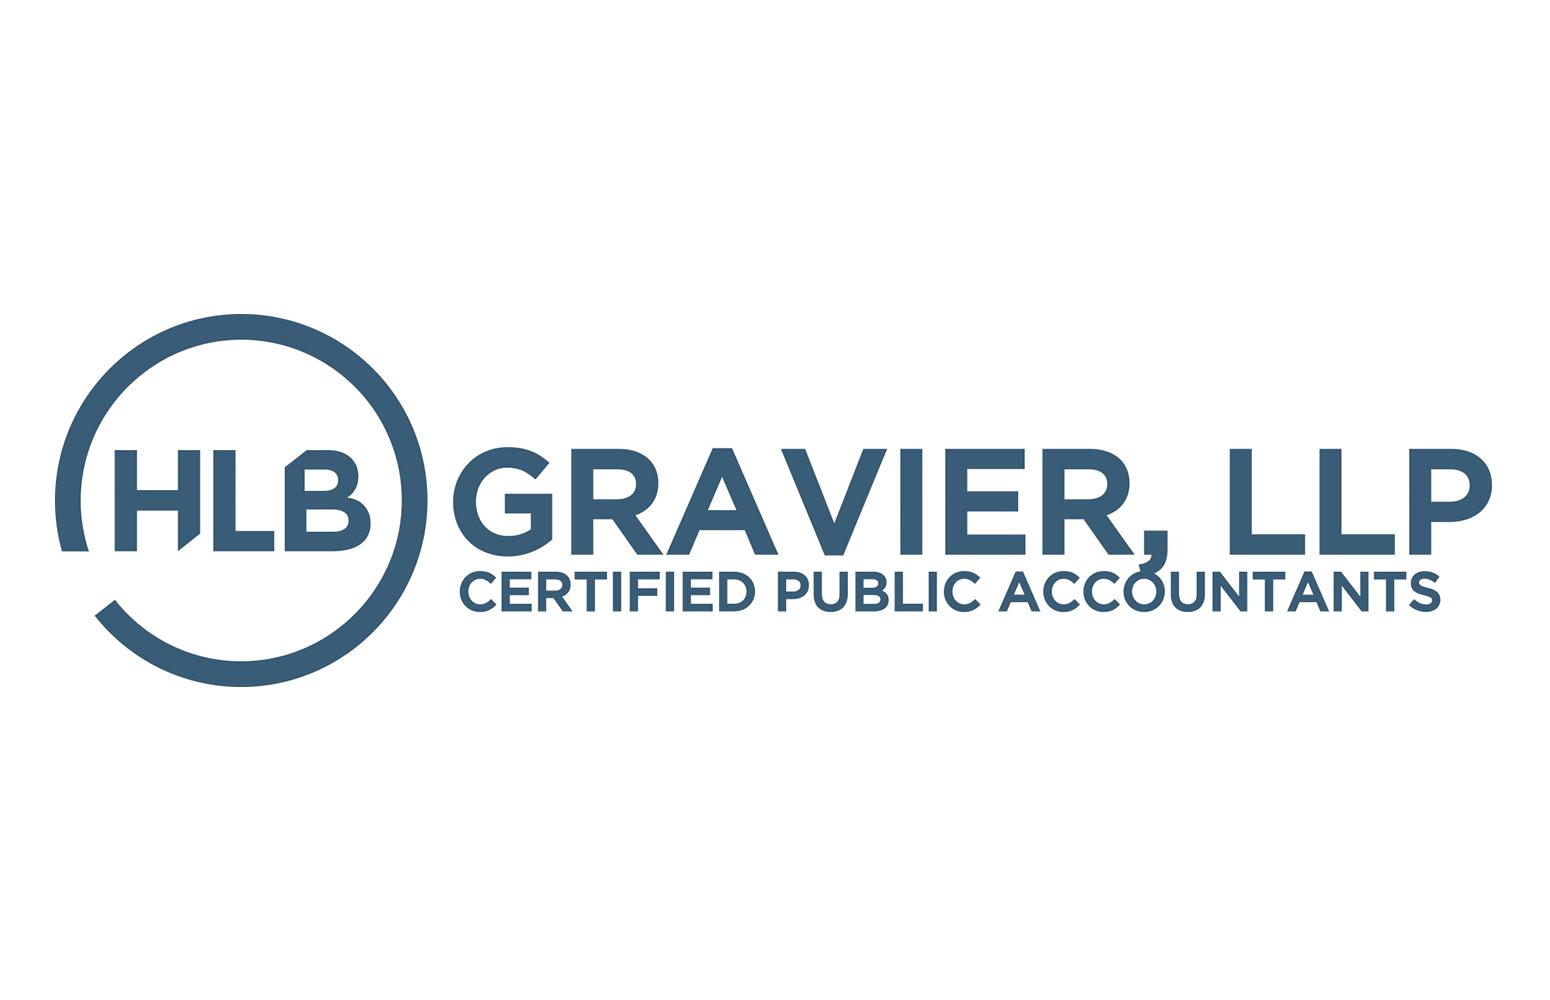 HLB Gravier, LLP